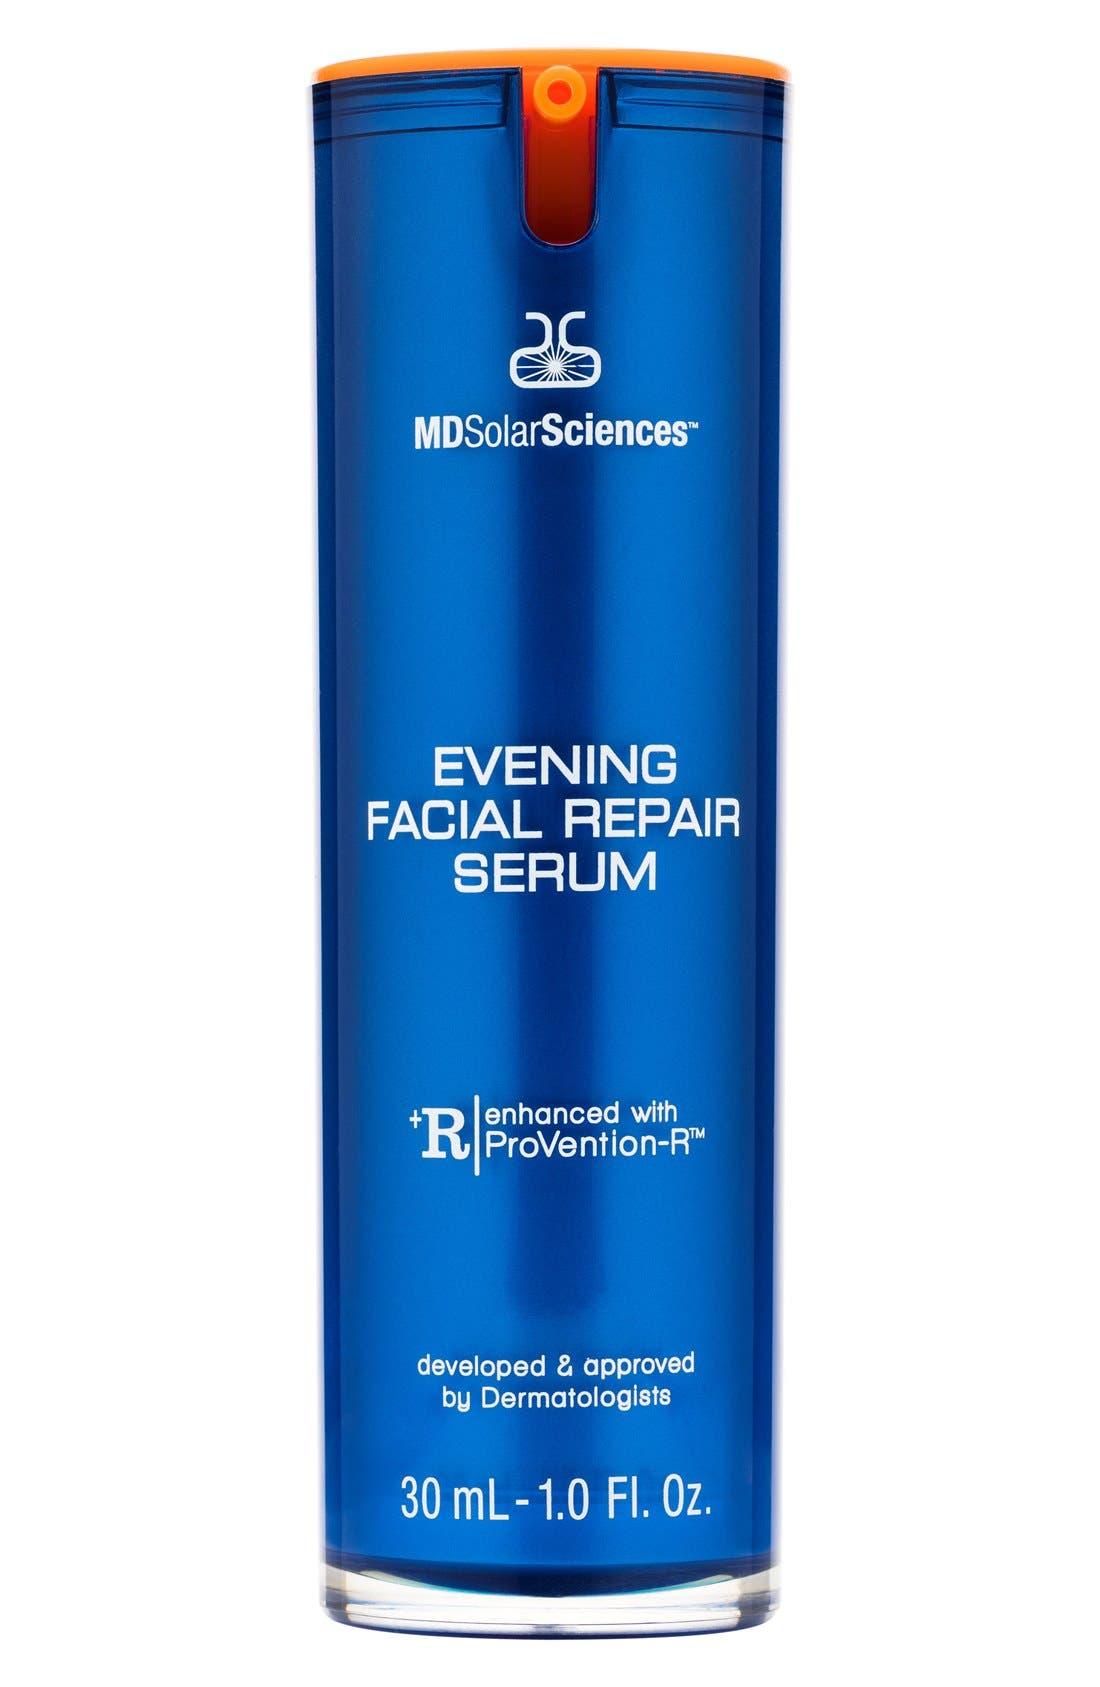 MDSolarSciences™ Evening Facial Repair Serum